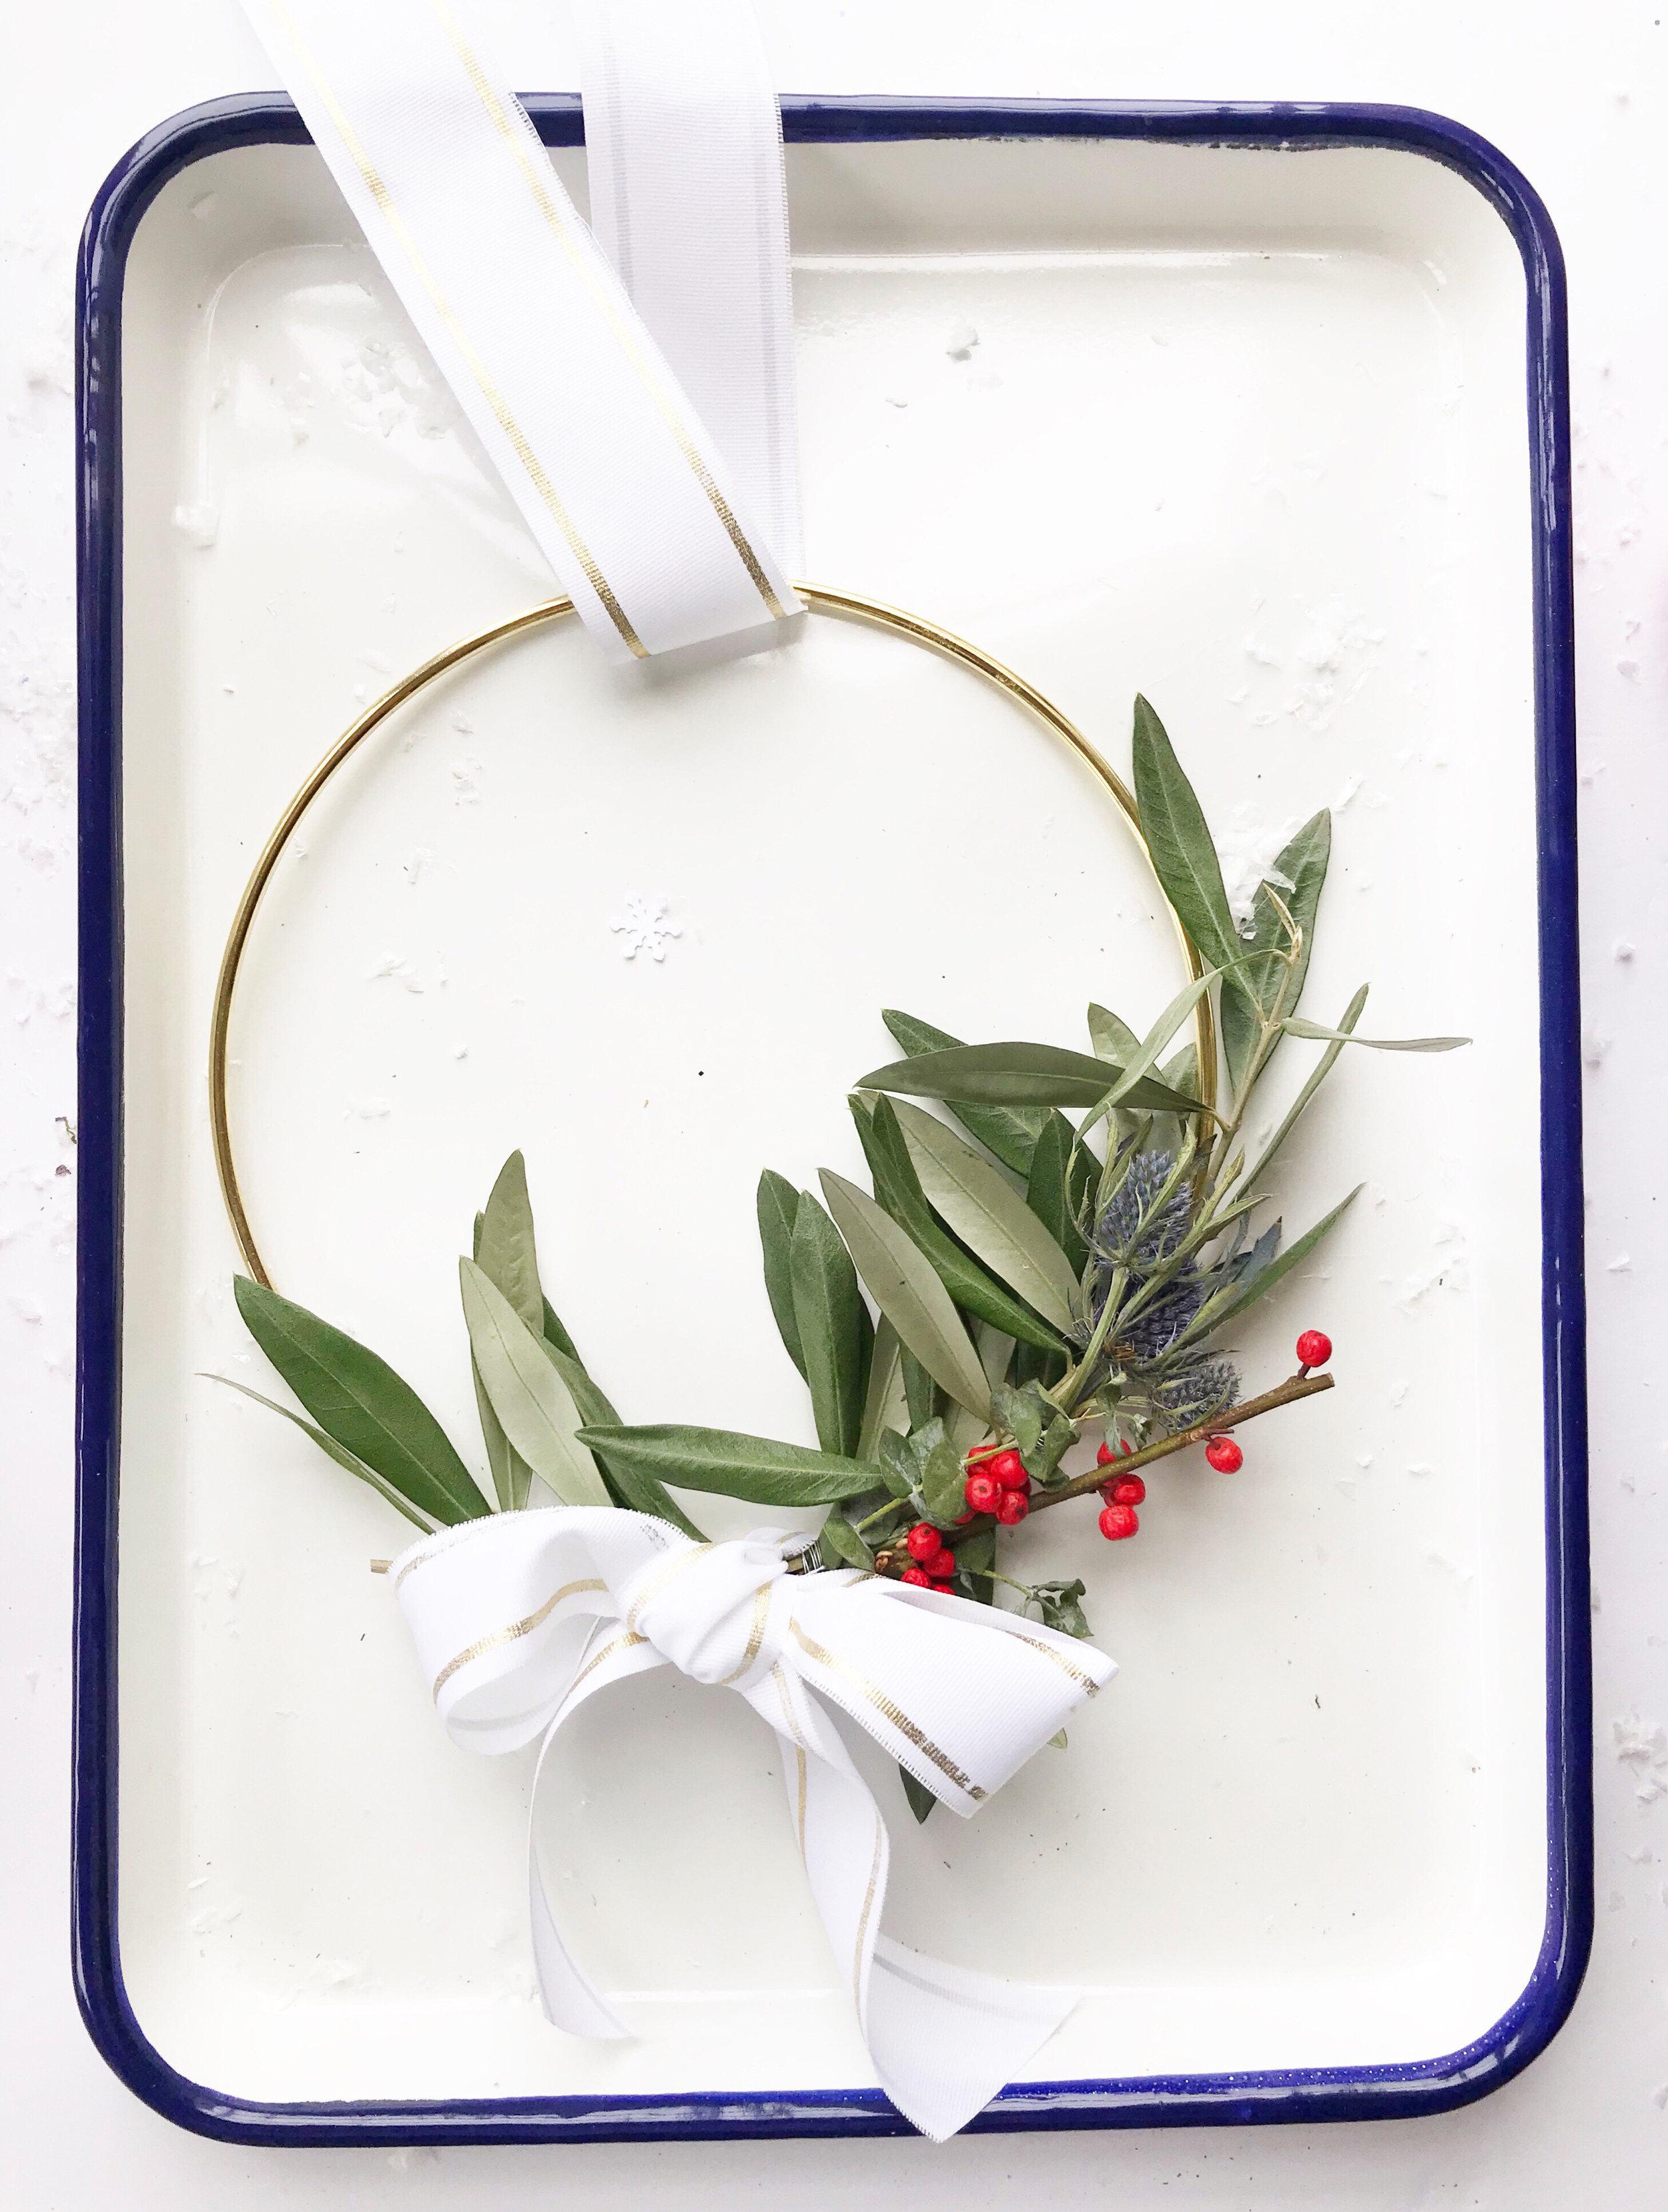 diy_holiday_wreath_14.jpg